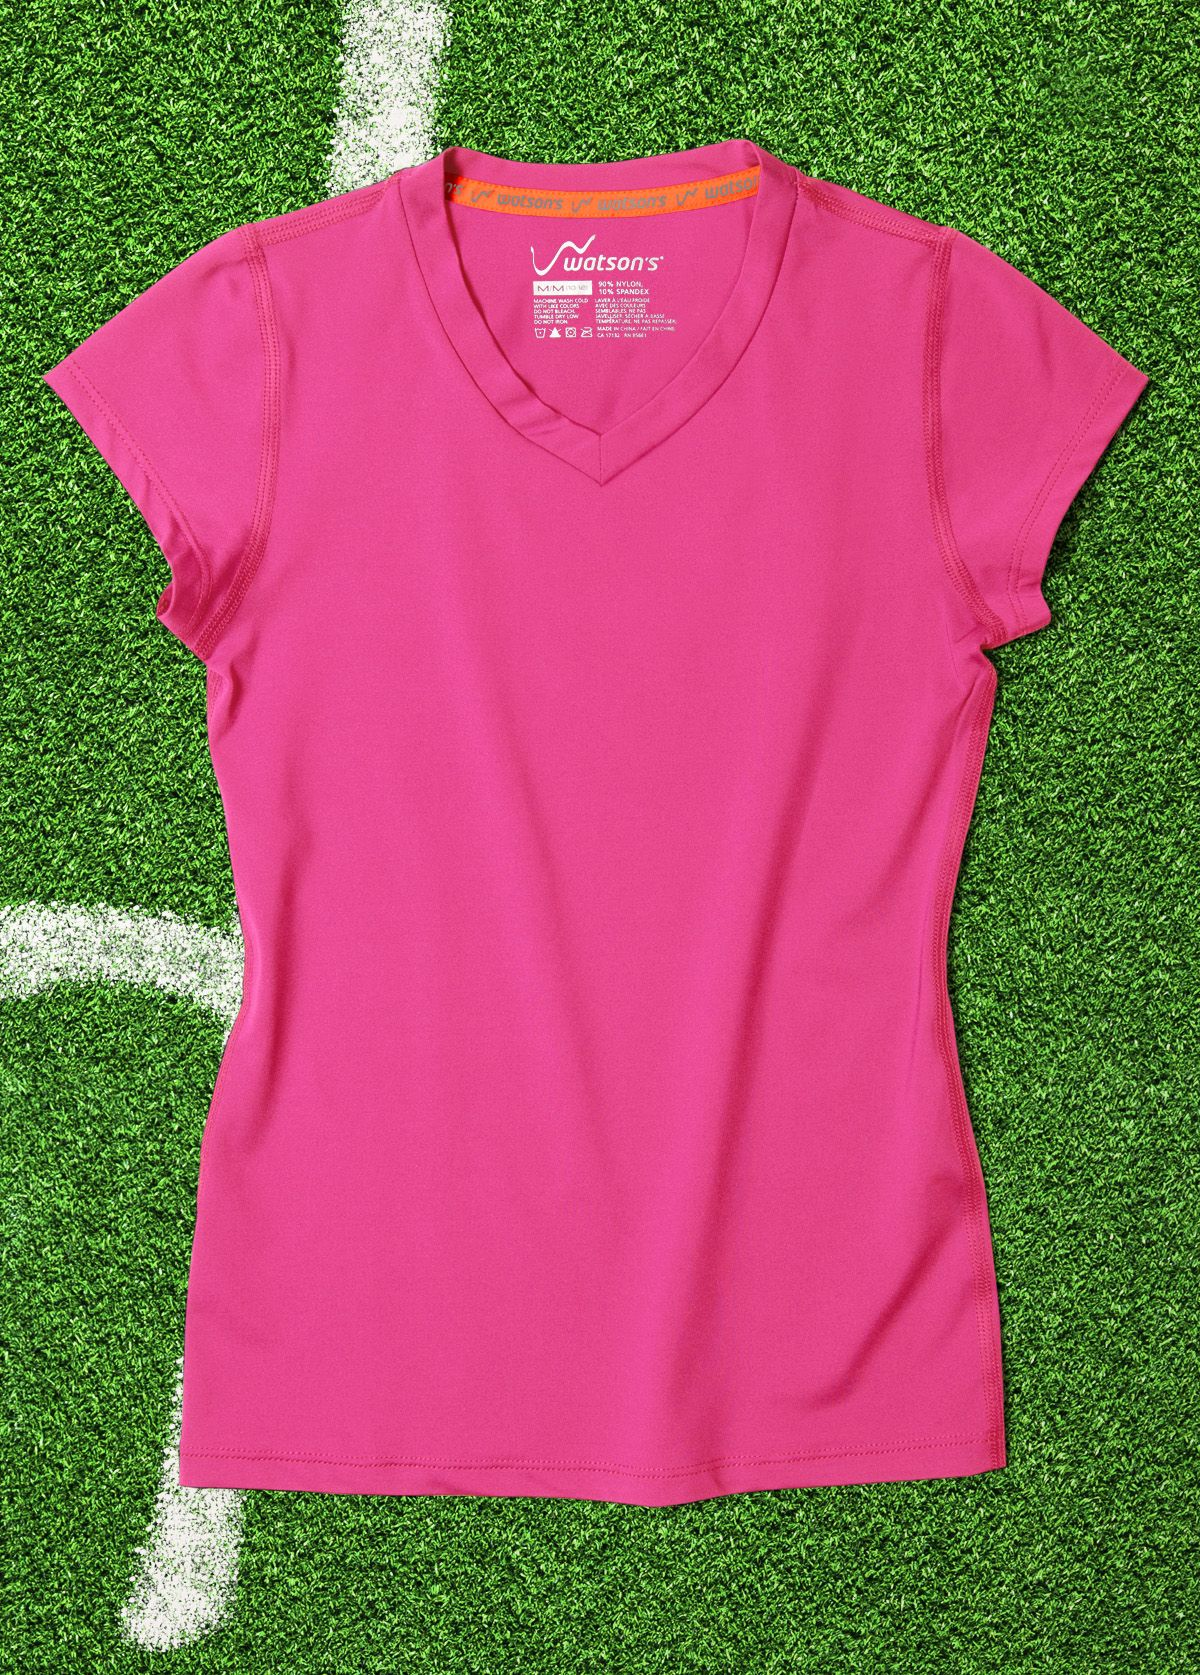 944df2ee Pink Girl #T-Shirt   90% nylon / 10% spandex - Watson's #Sport #Apparel